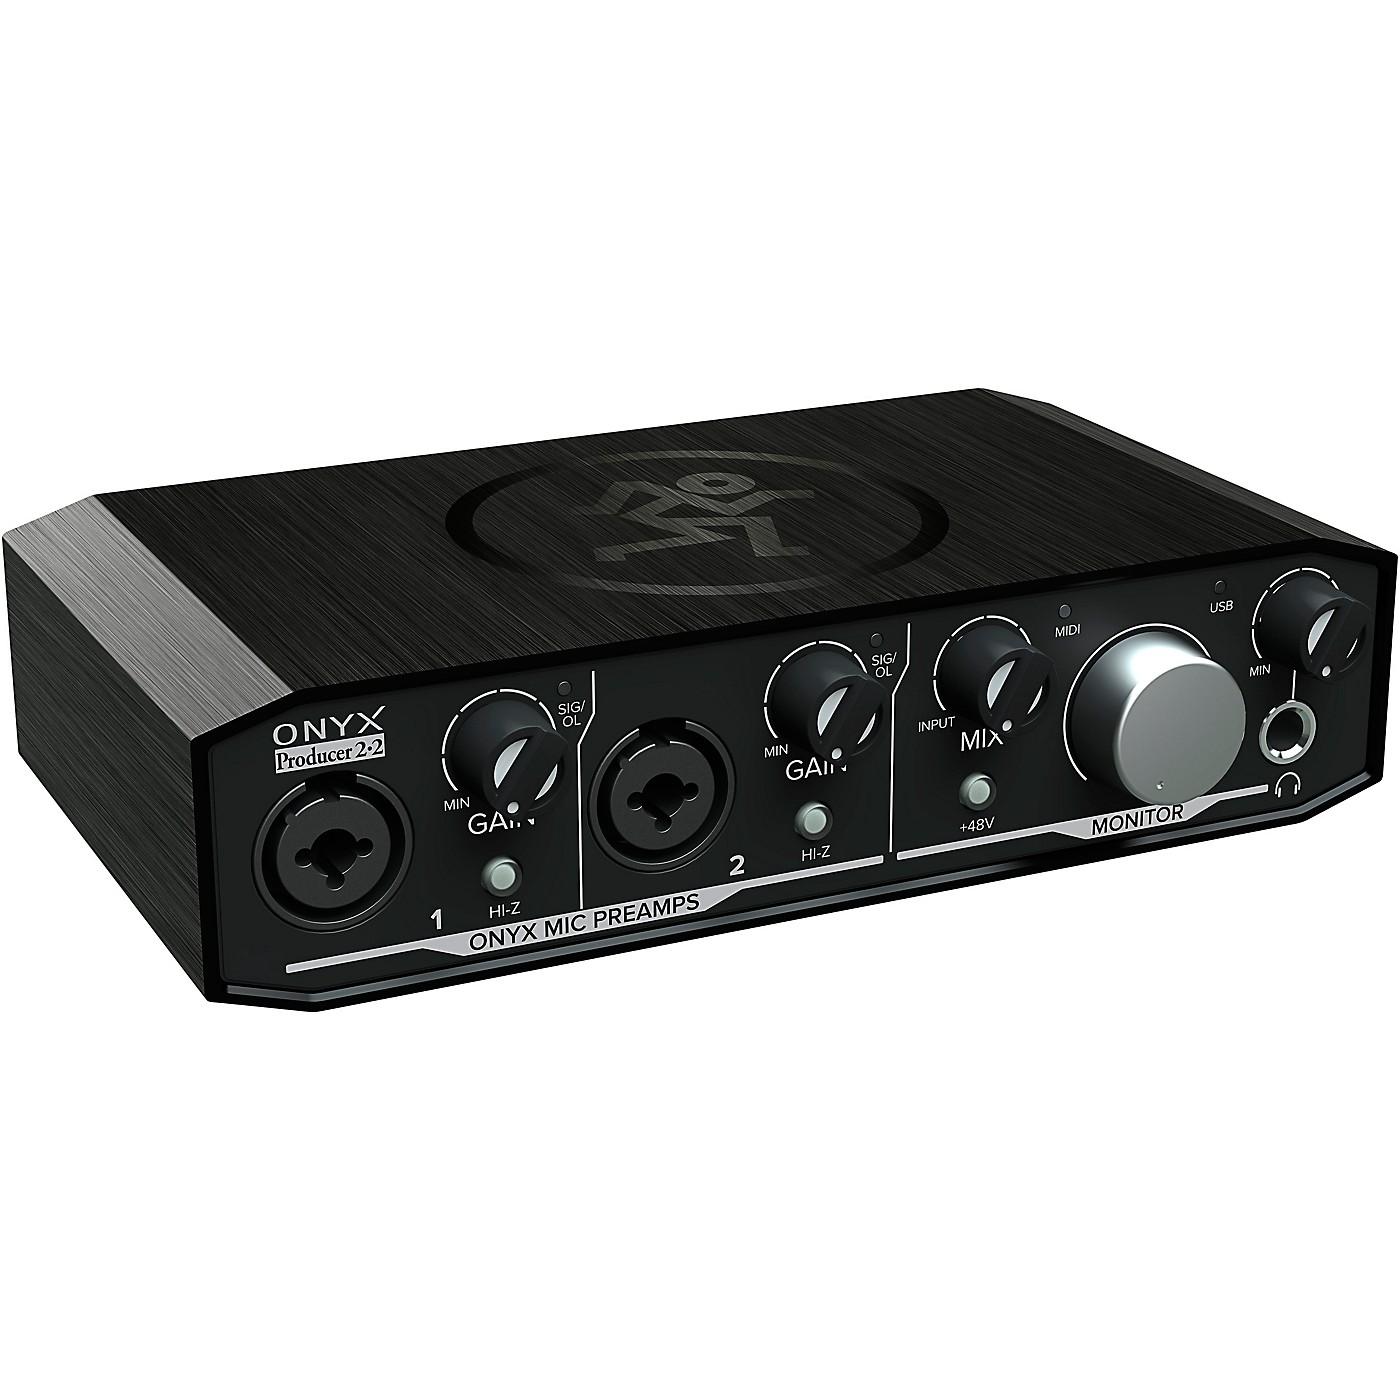 Mackie Onyx Producer 2x2 USB Audio Interface with MIDI thumbnail